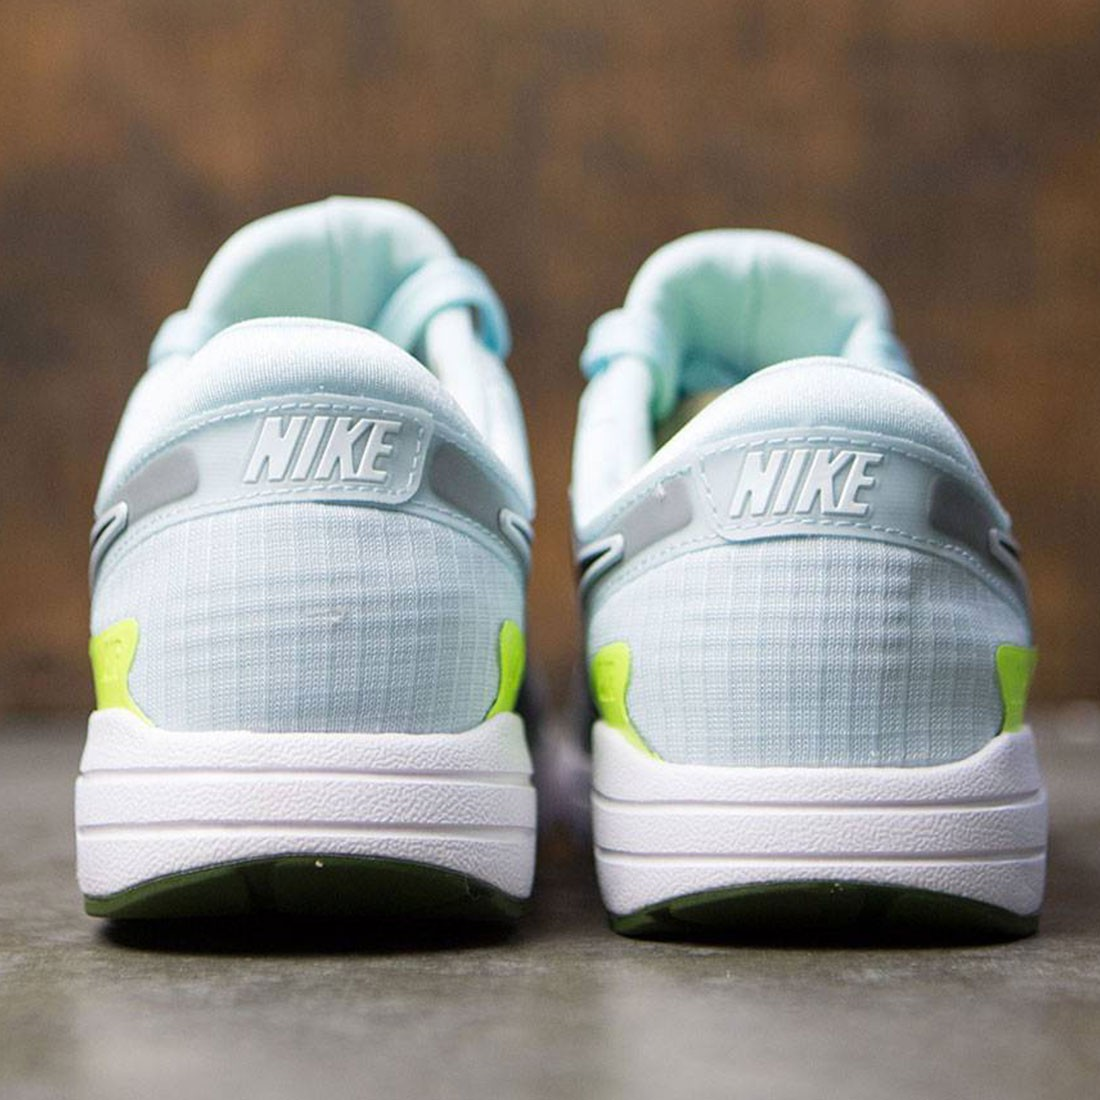 Nike Air Max Zero SI Damen LMTD 881173 400 glacier blue//legion green//white//blac